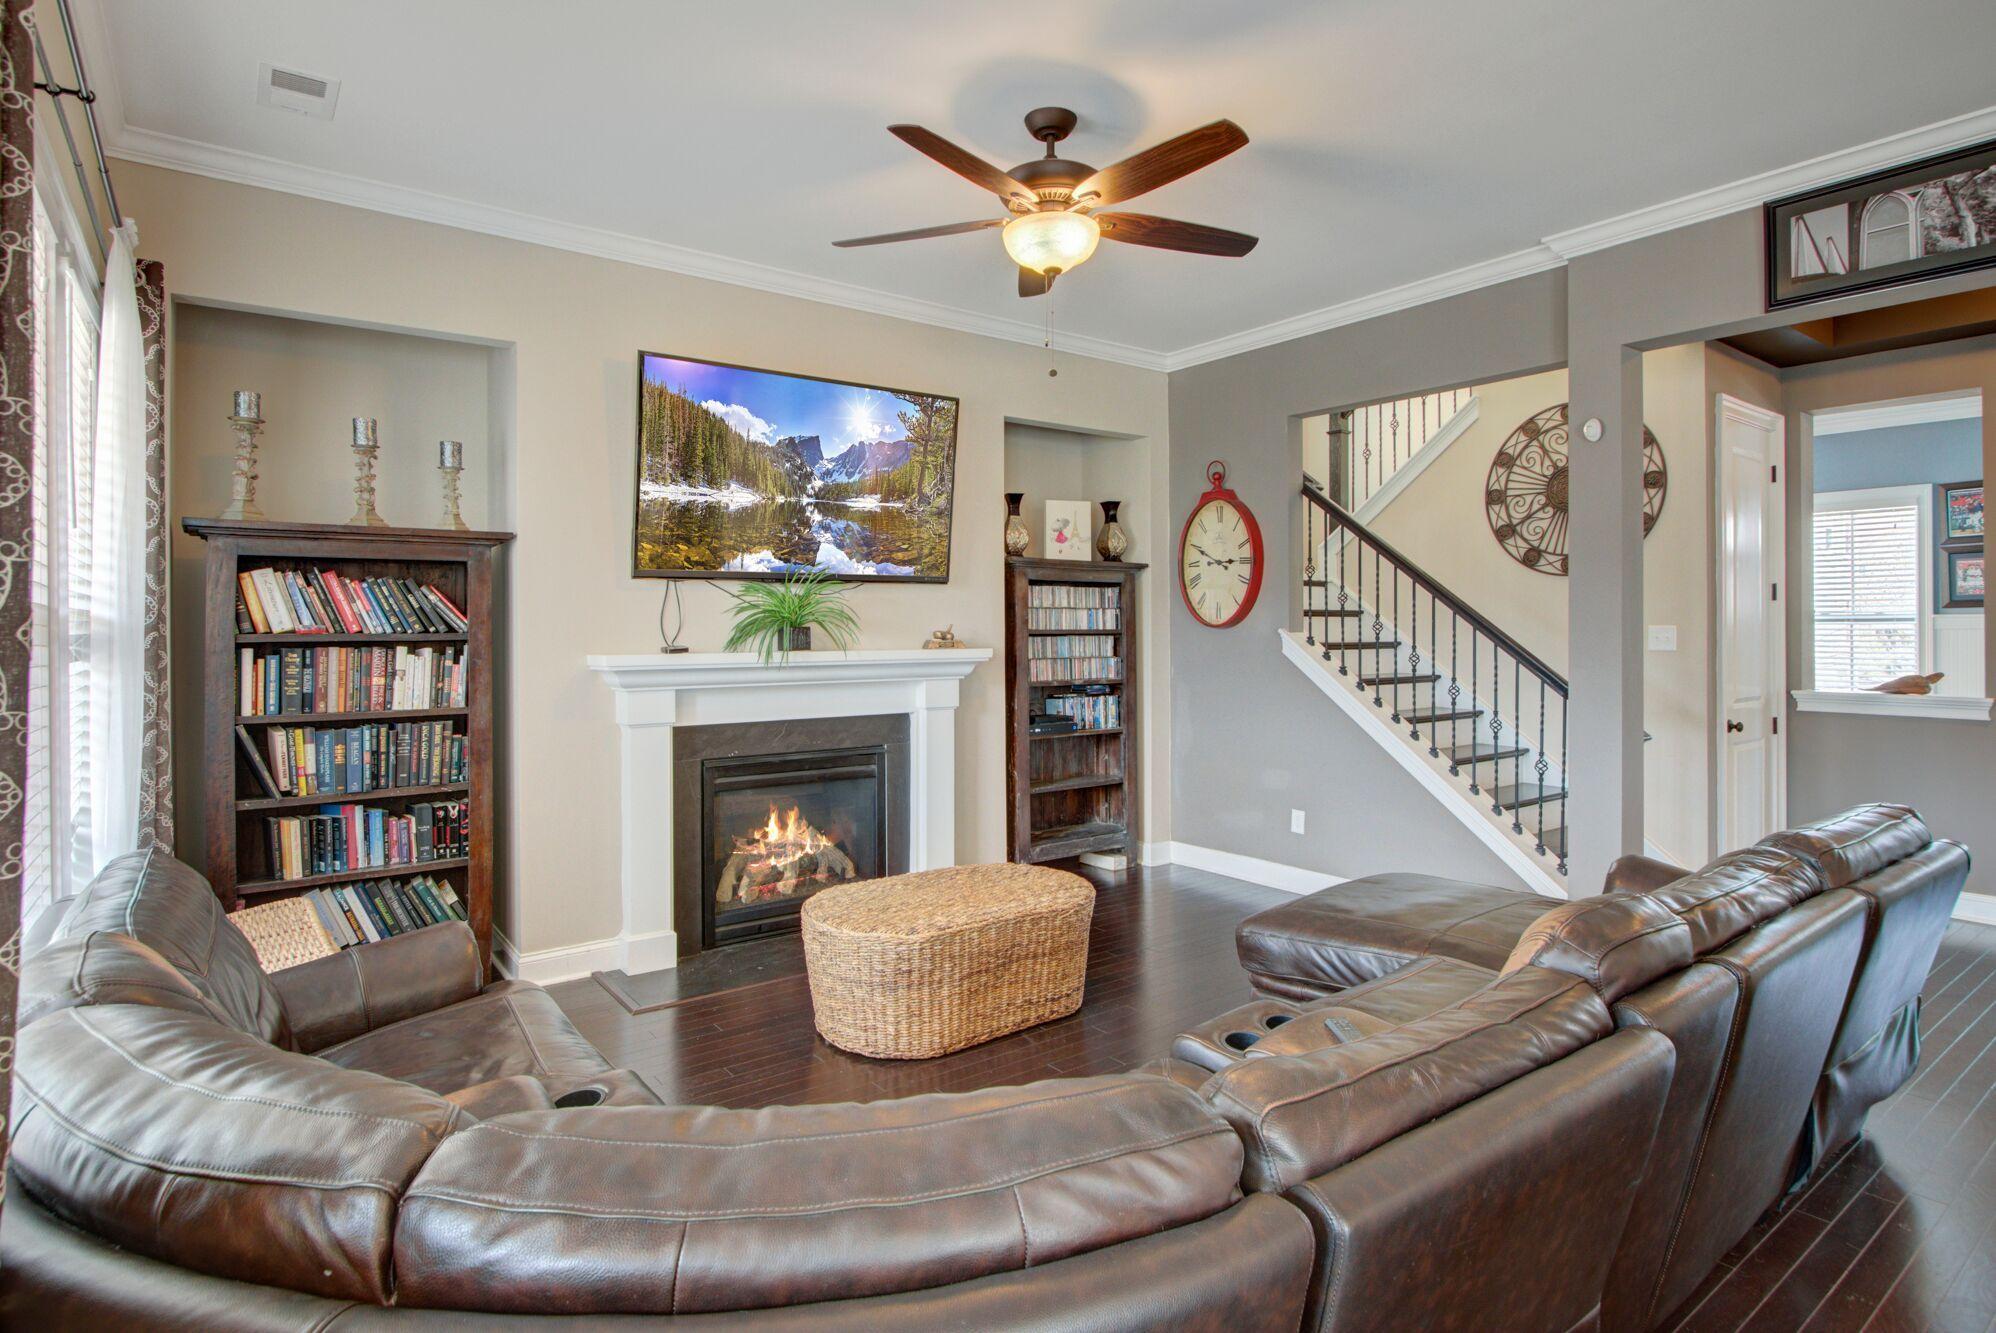 Carolina Park Homes For Sale - 3614 Shutesbury, Mount Pleasant, SC - 31